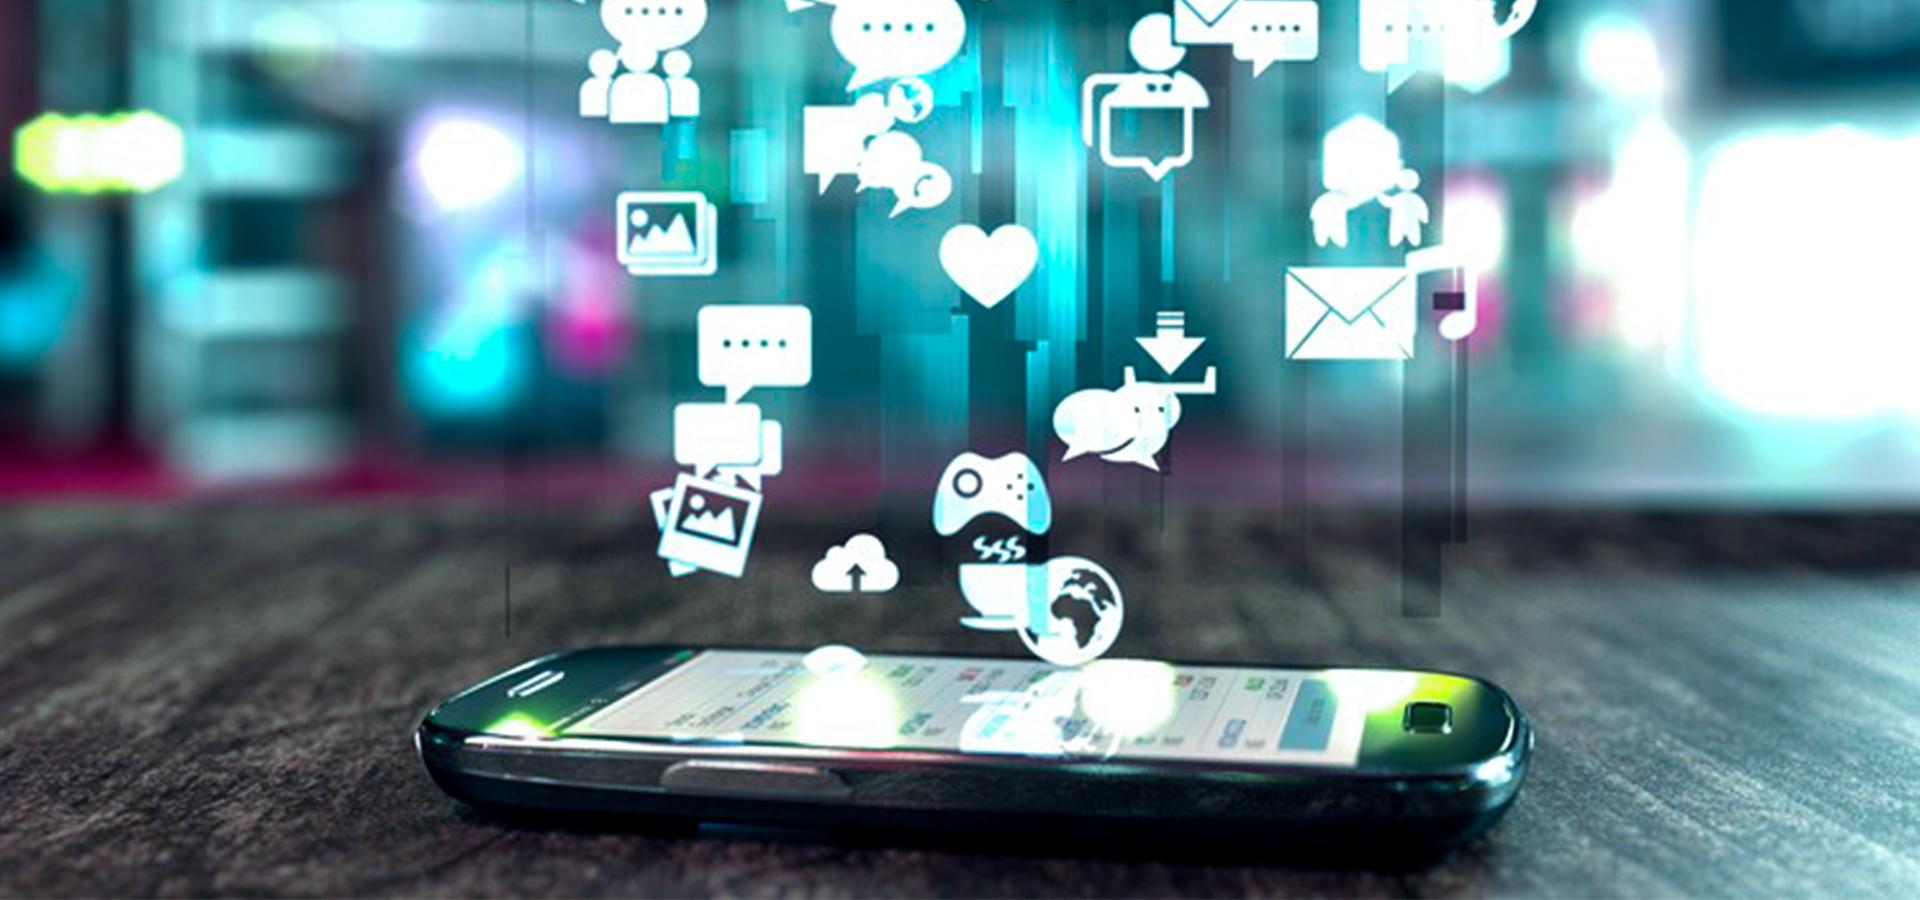 Upcoming Mobile App Development Trends 2019 - Brain Technosys